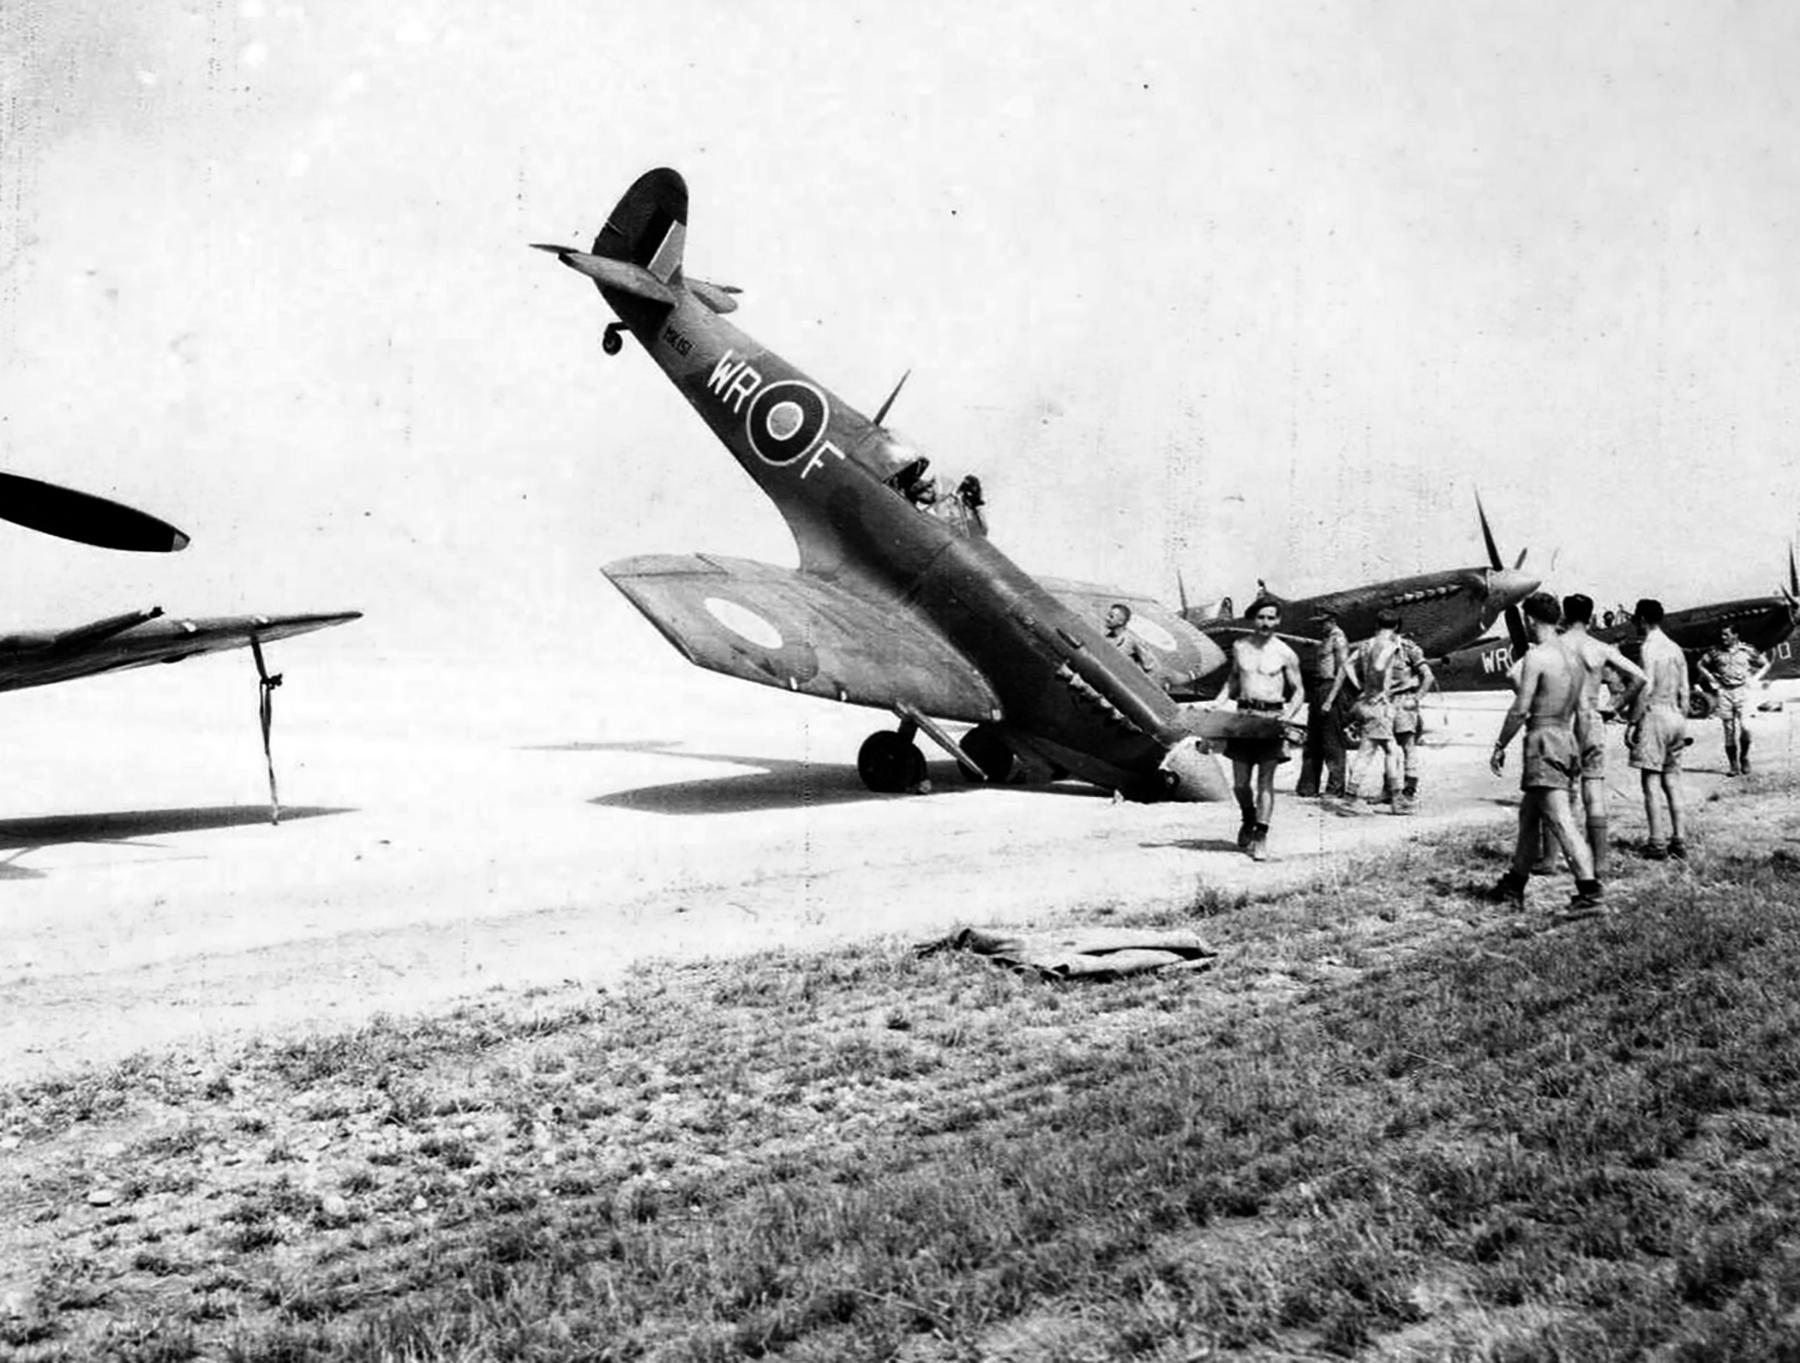 Spitfire LFIXc SAAF 40Sqn MK151 Italy 1943 02